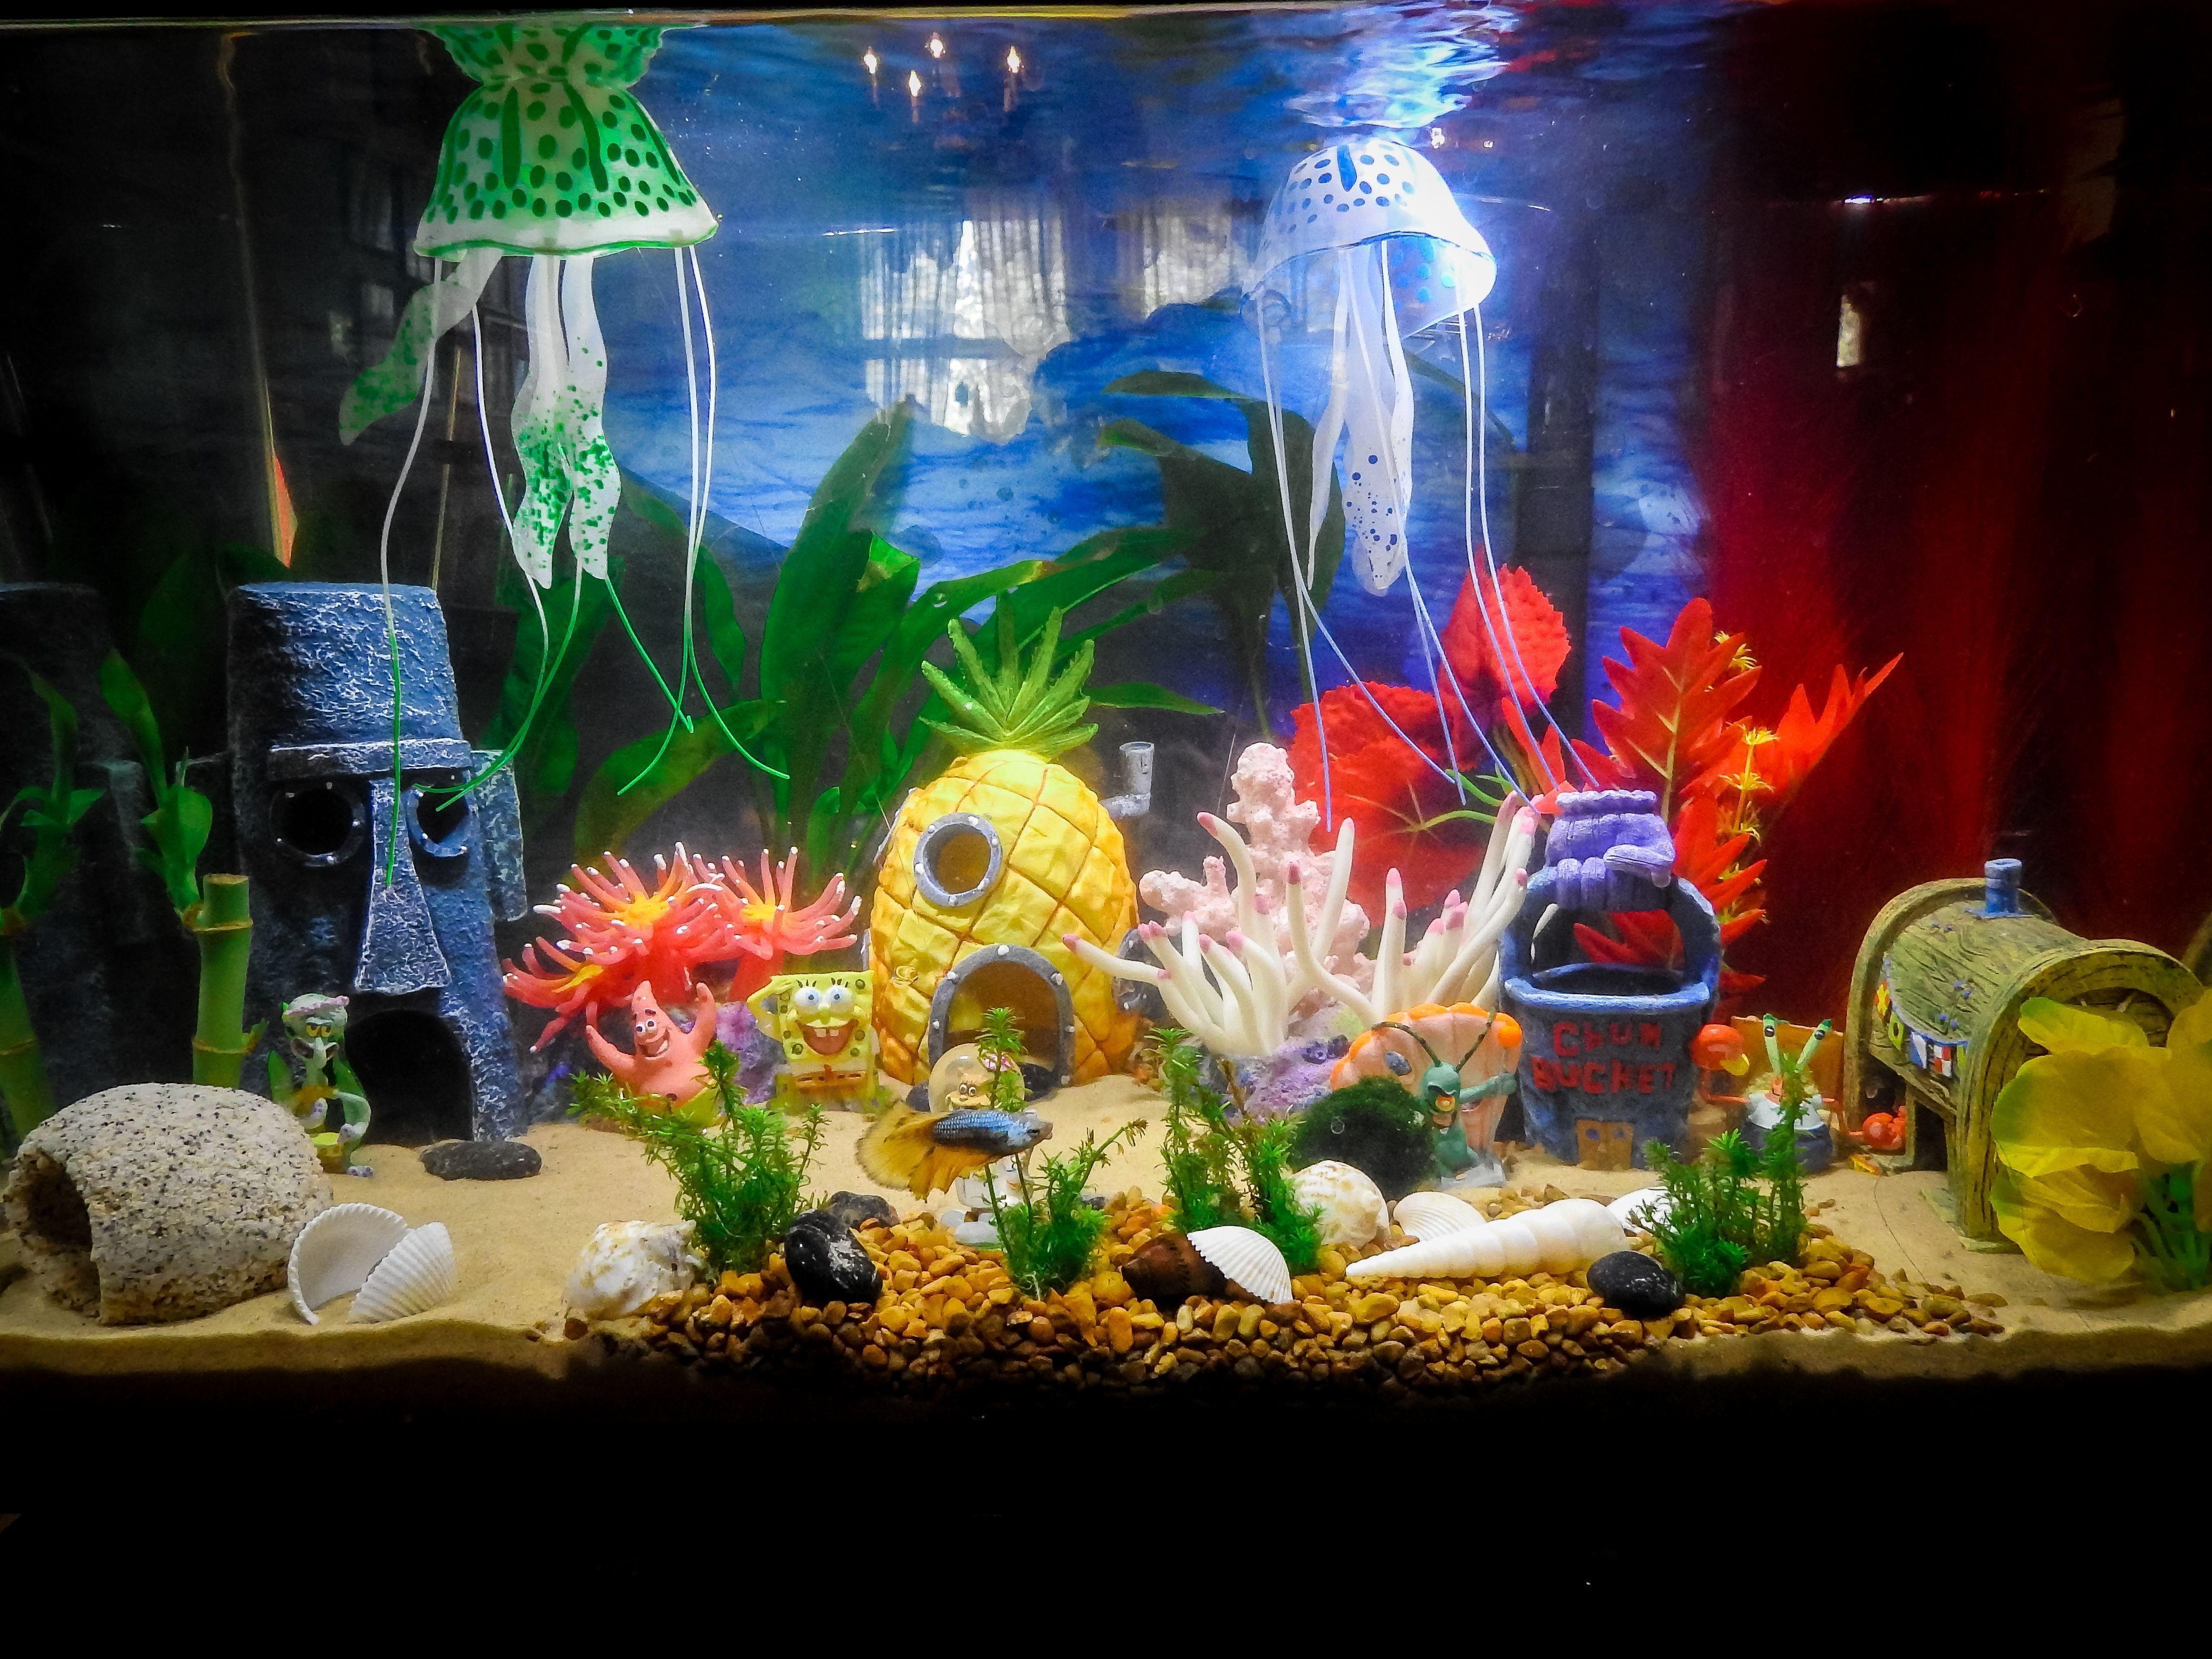 How Hollywood Got Aquarium Decorations Diy All Wrong Pix Pig Fish Tank Themes Fresh Water Fish Tank Aquarium